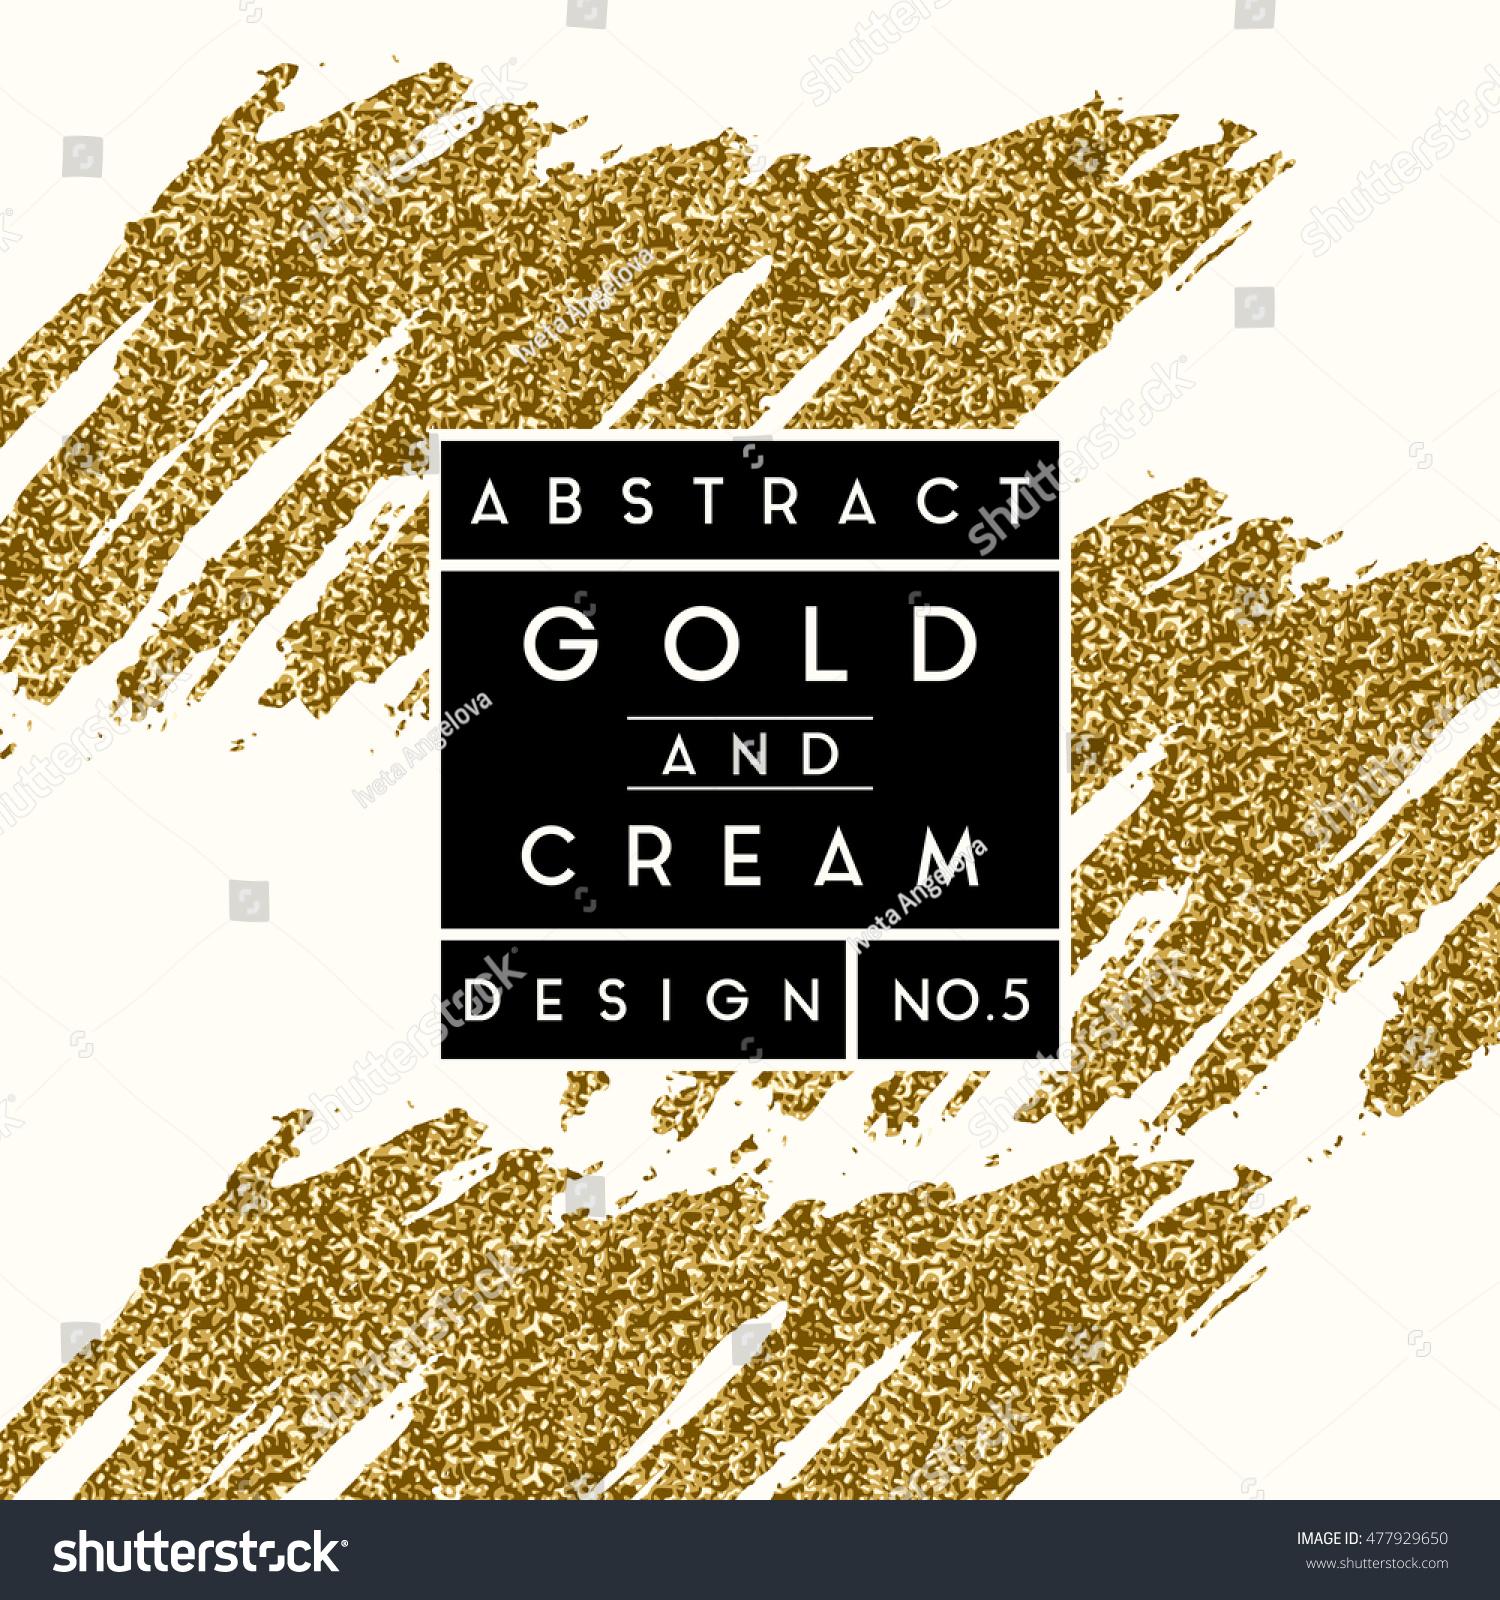 Abstract design gold glitter shapes on stock vector 477929650 abstract design gold glitter shapes on stock vector 477929650 shutterstock stopboris Choice Image